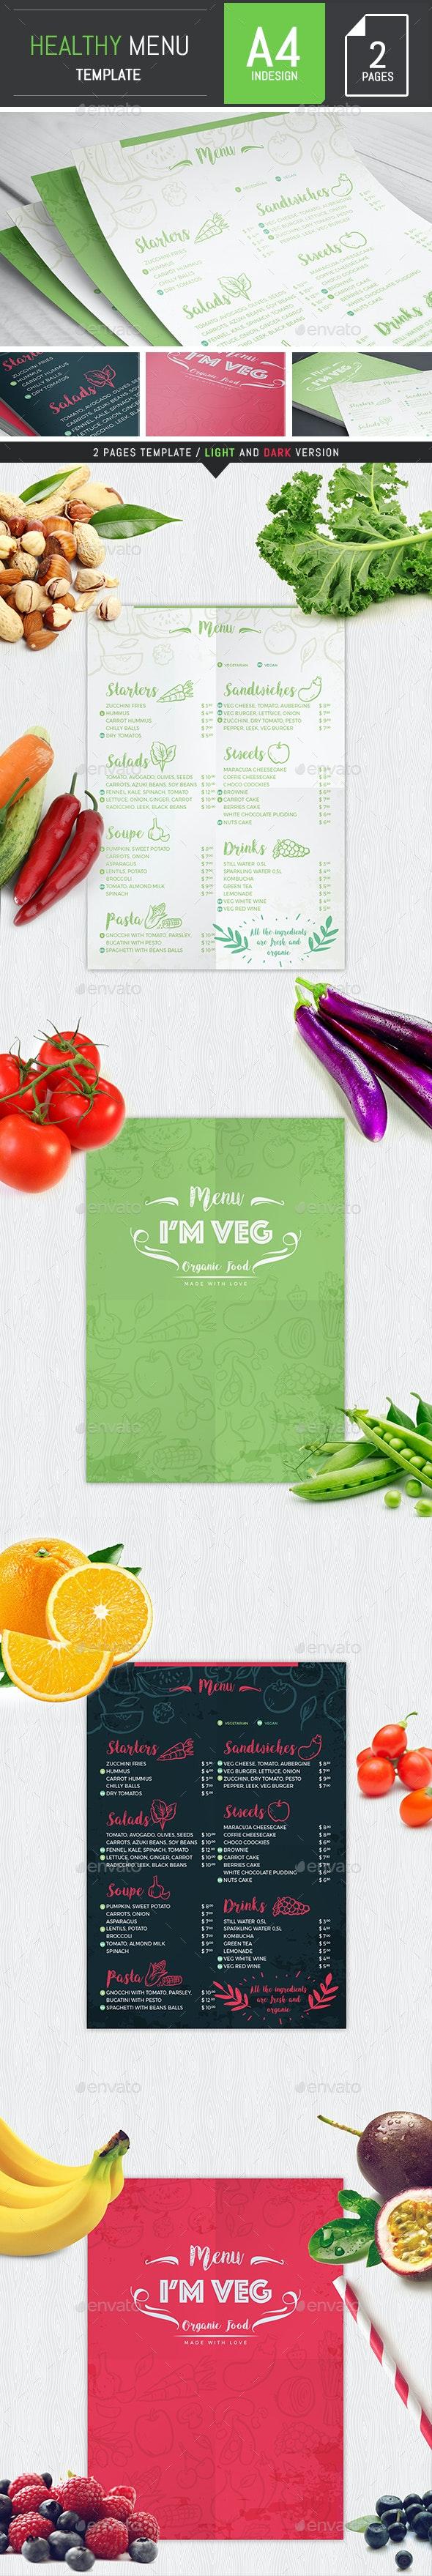 Healthy Food Restaurant Menu Template - Food Menus Print Templates